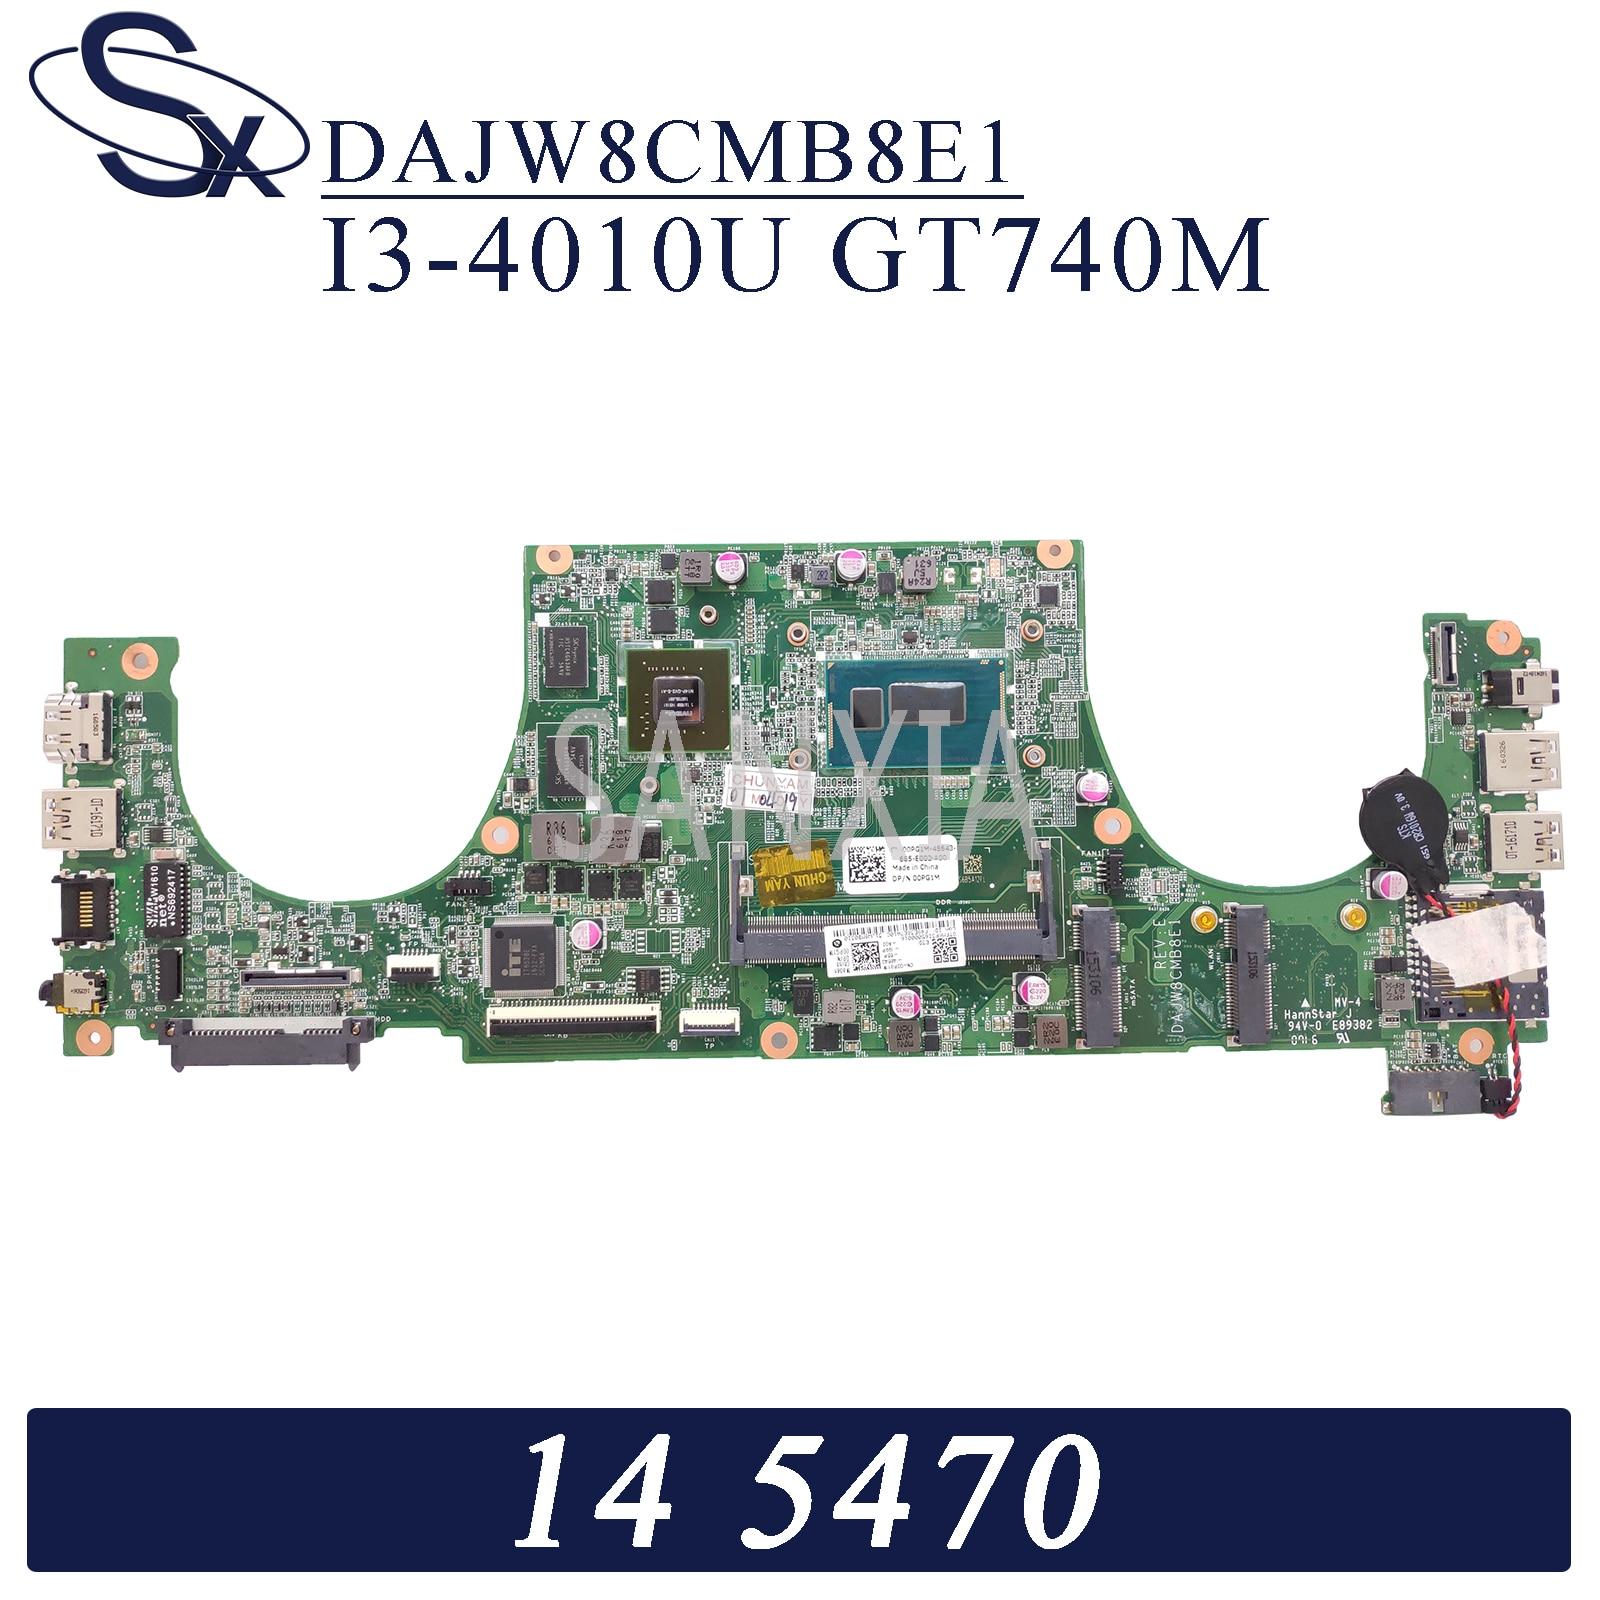 KEFU DAJW8CMB8E1 carte mère dordinateur portable pour Dell Vostro 14-5470 carte mère dorigine I3-4010U GT740M